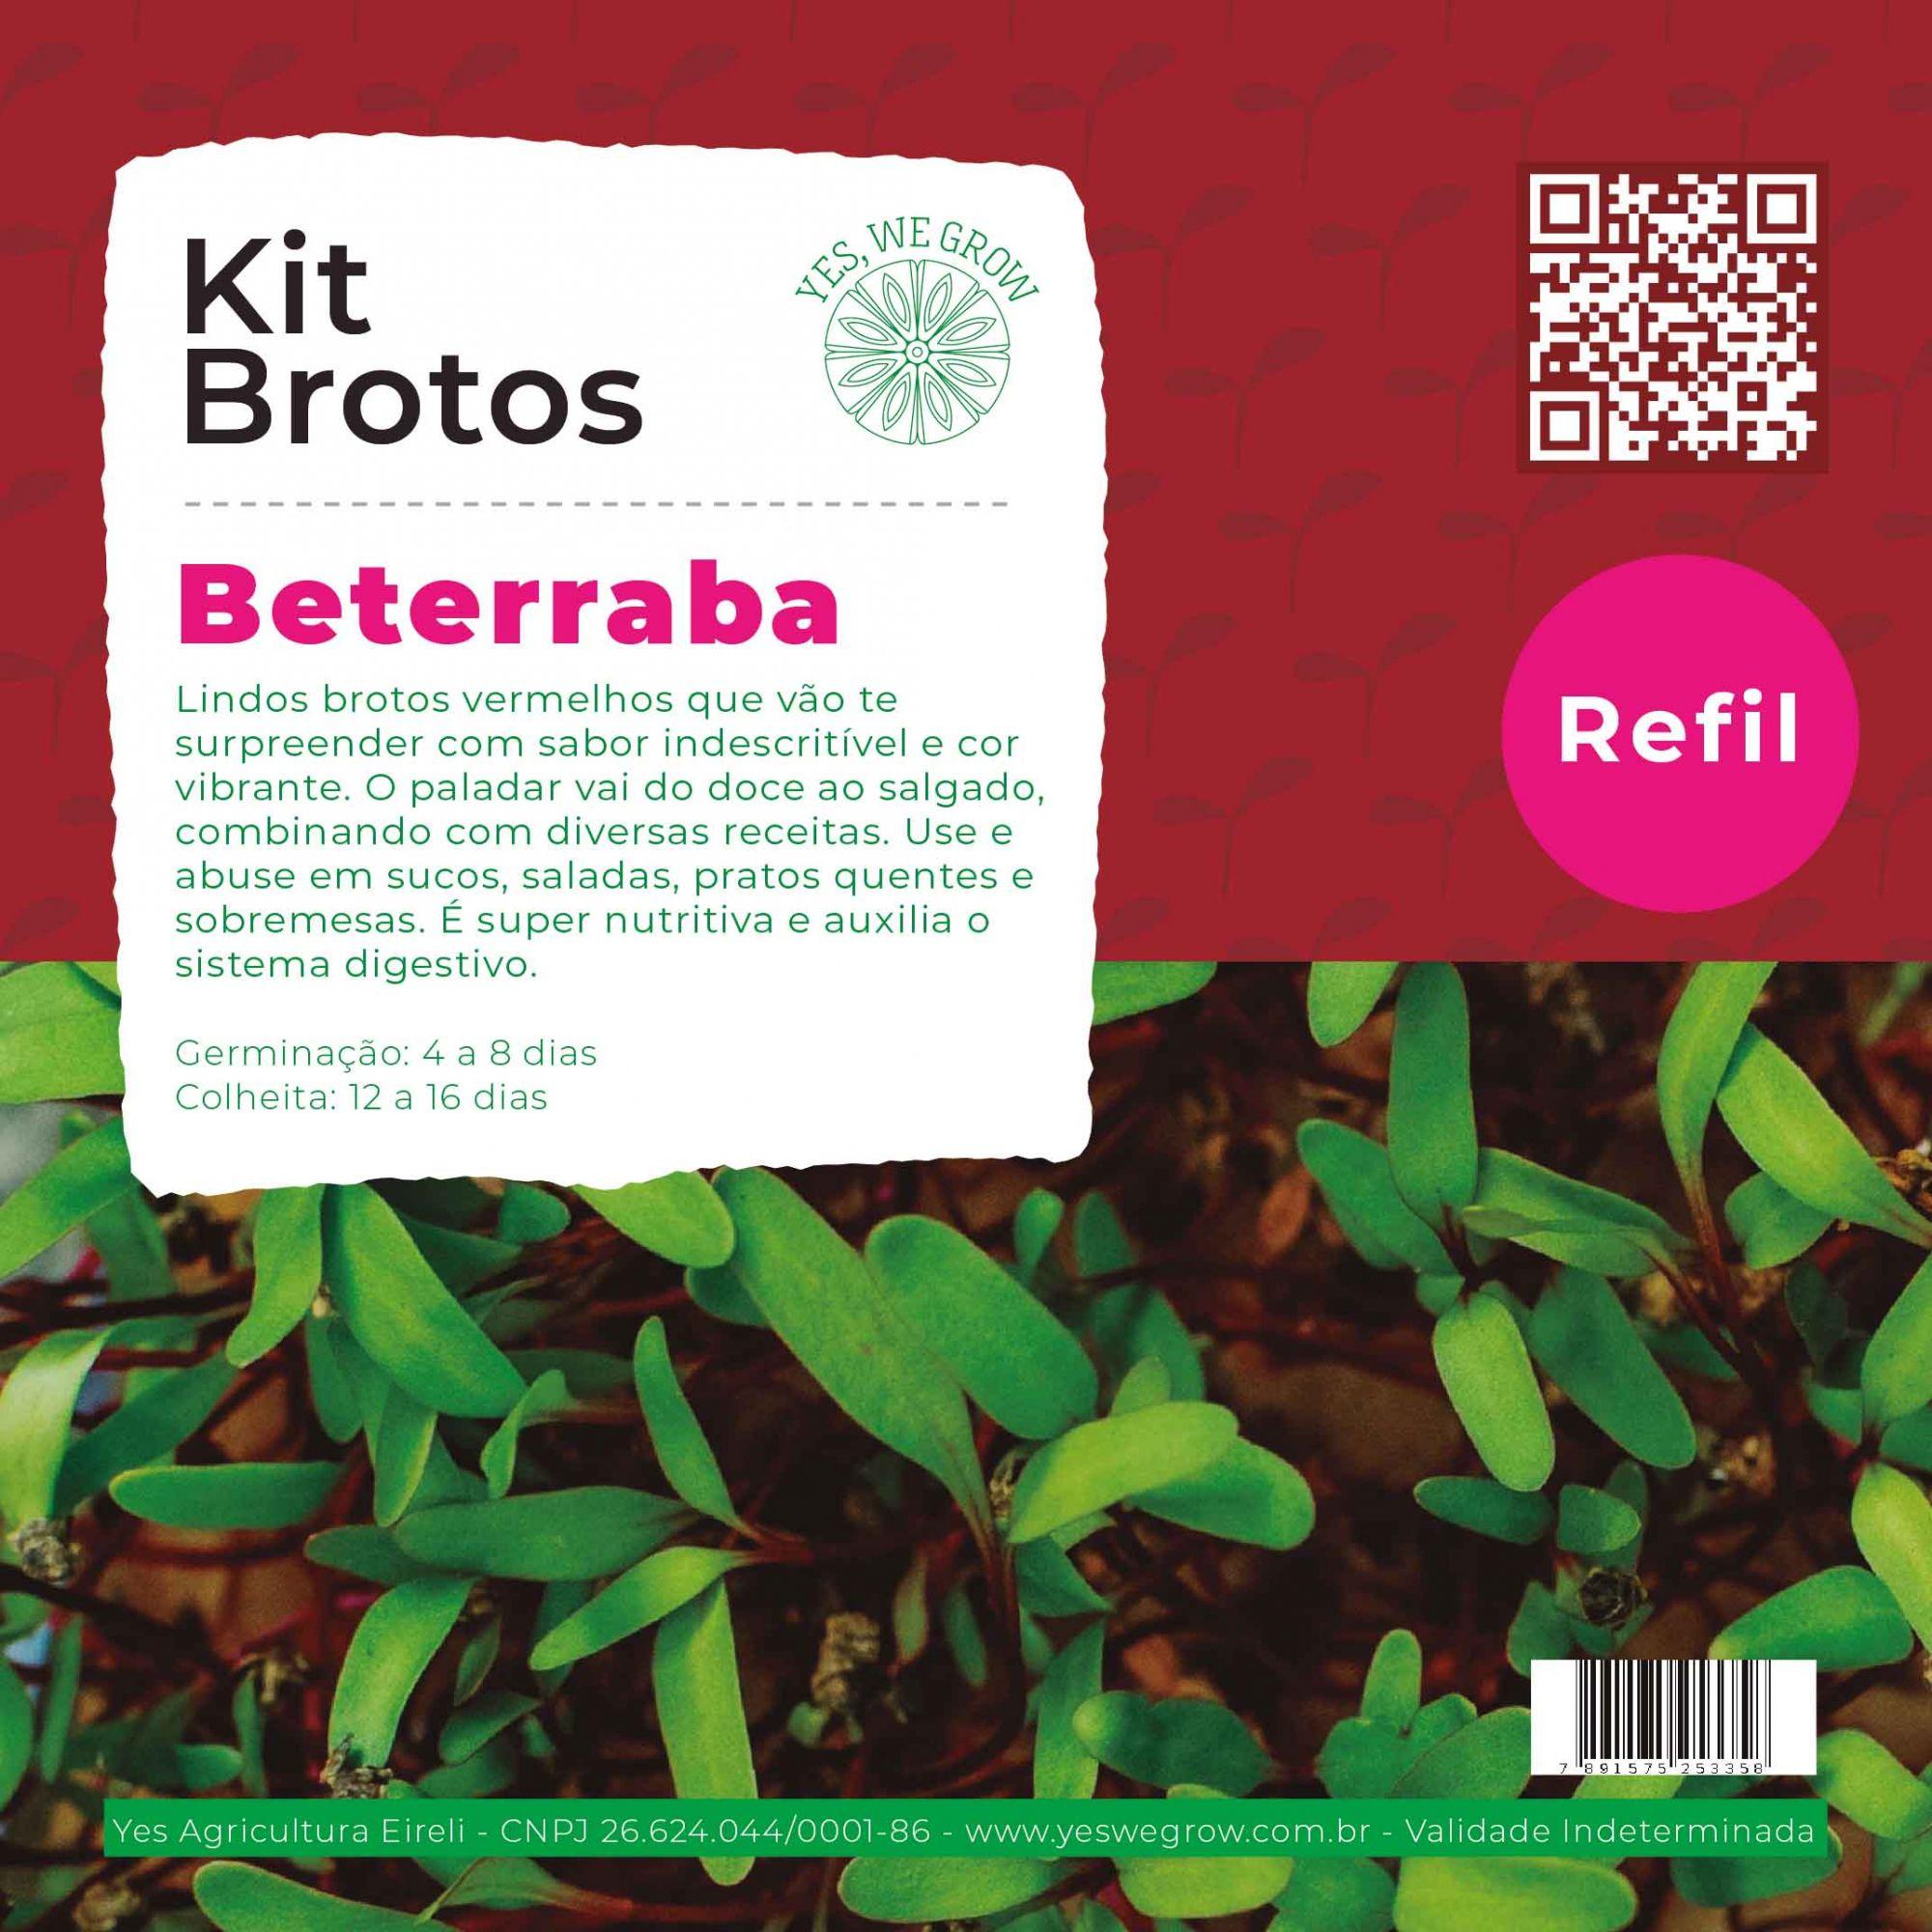 Refil para Kit Brotos Beterraba